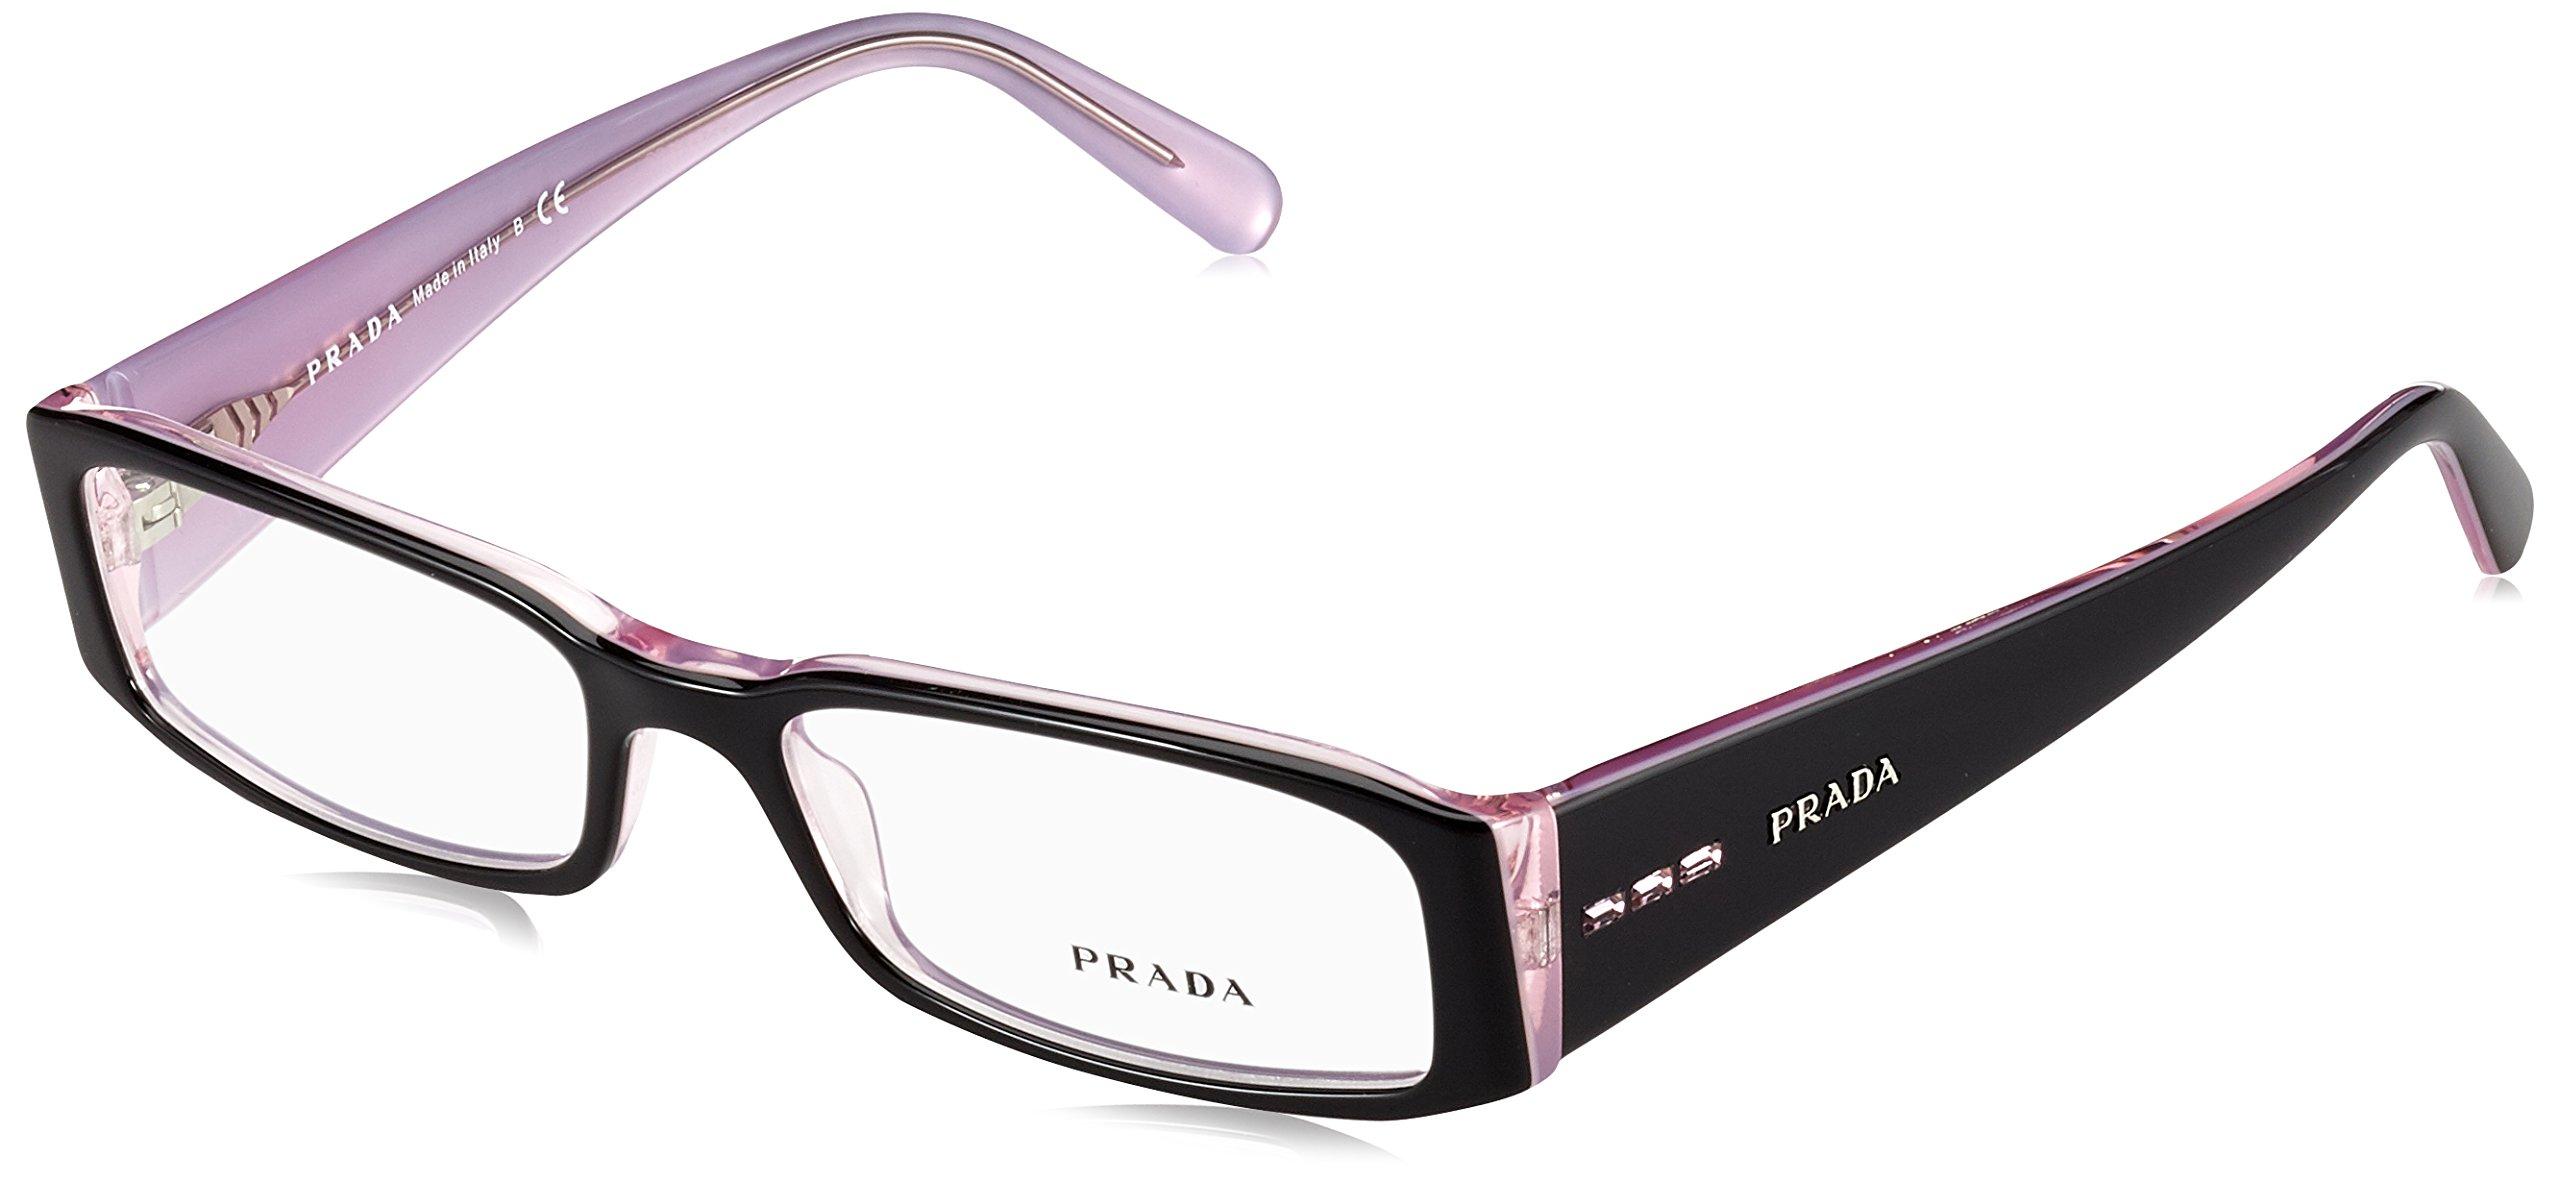 PRADA EYEGLASSES VPR 10F BLACK 3AX-101 VPR10FENTIC by Prada (Image #1)